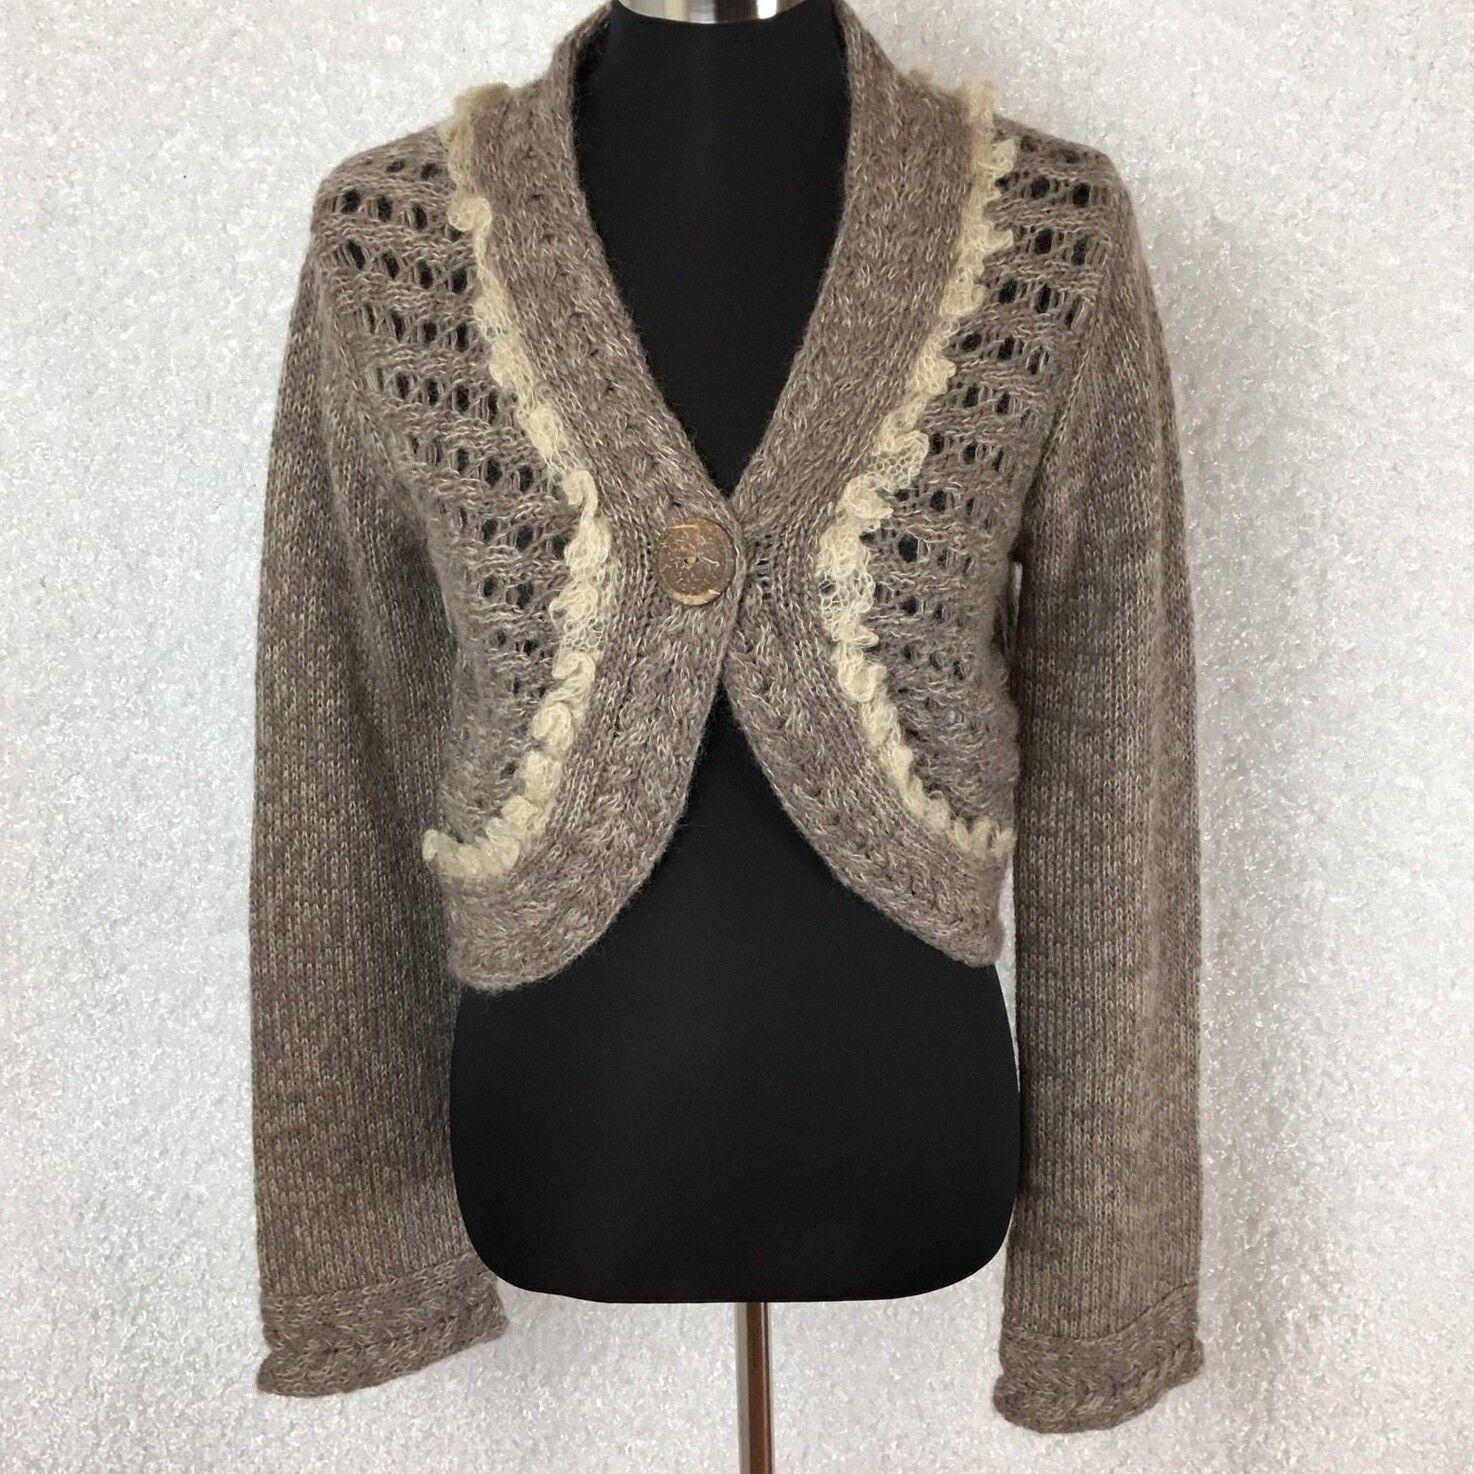 Anthropologie Sleeping On Snow Cardigan Sweater M Bolero Beige Button Alpaca